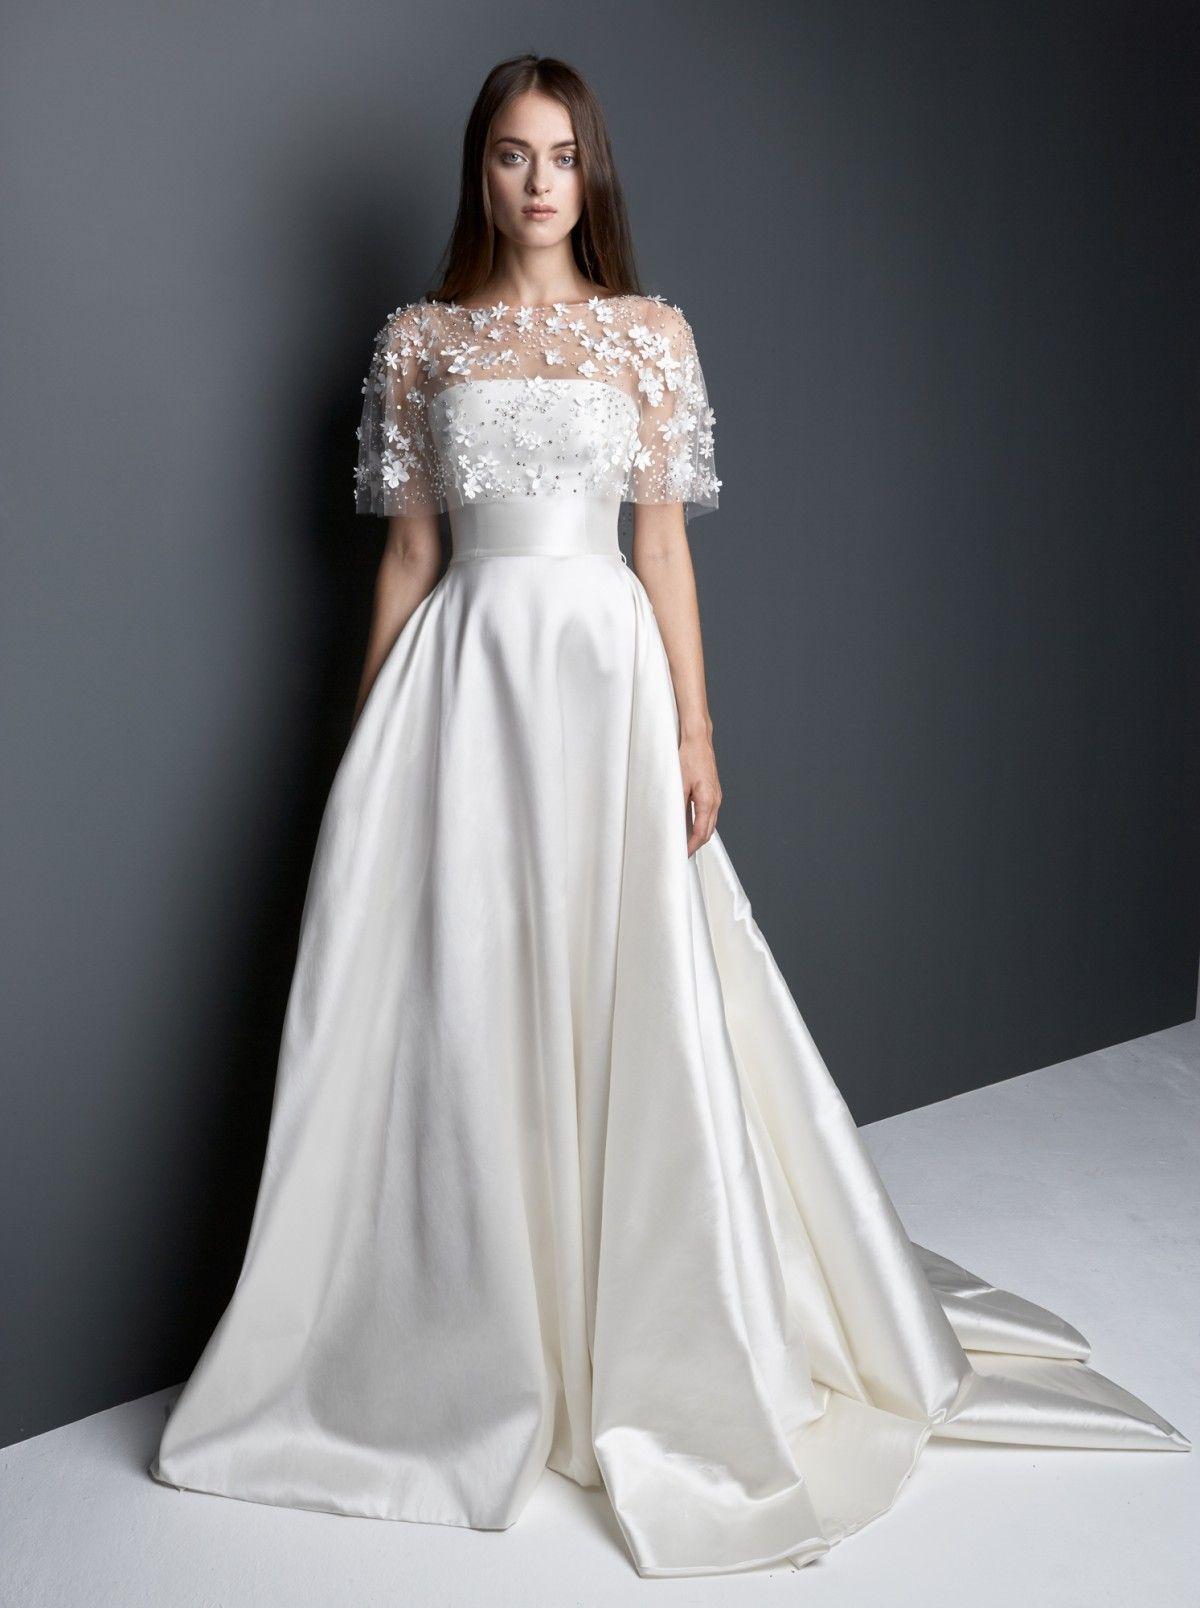 Georges hobeika bridal bridal collection wedding dresses